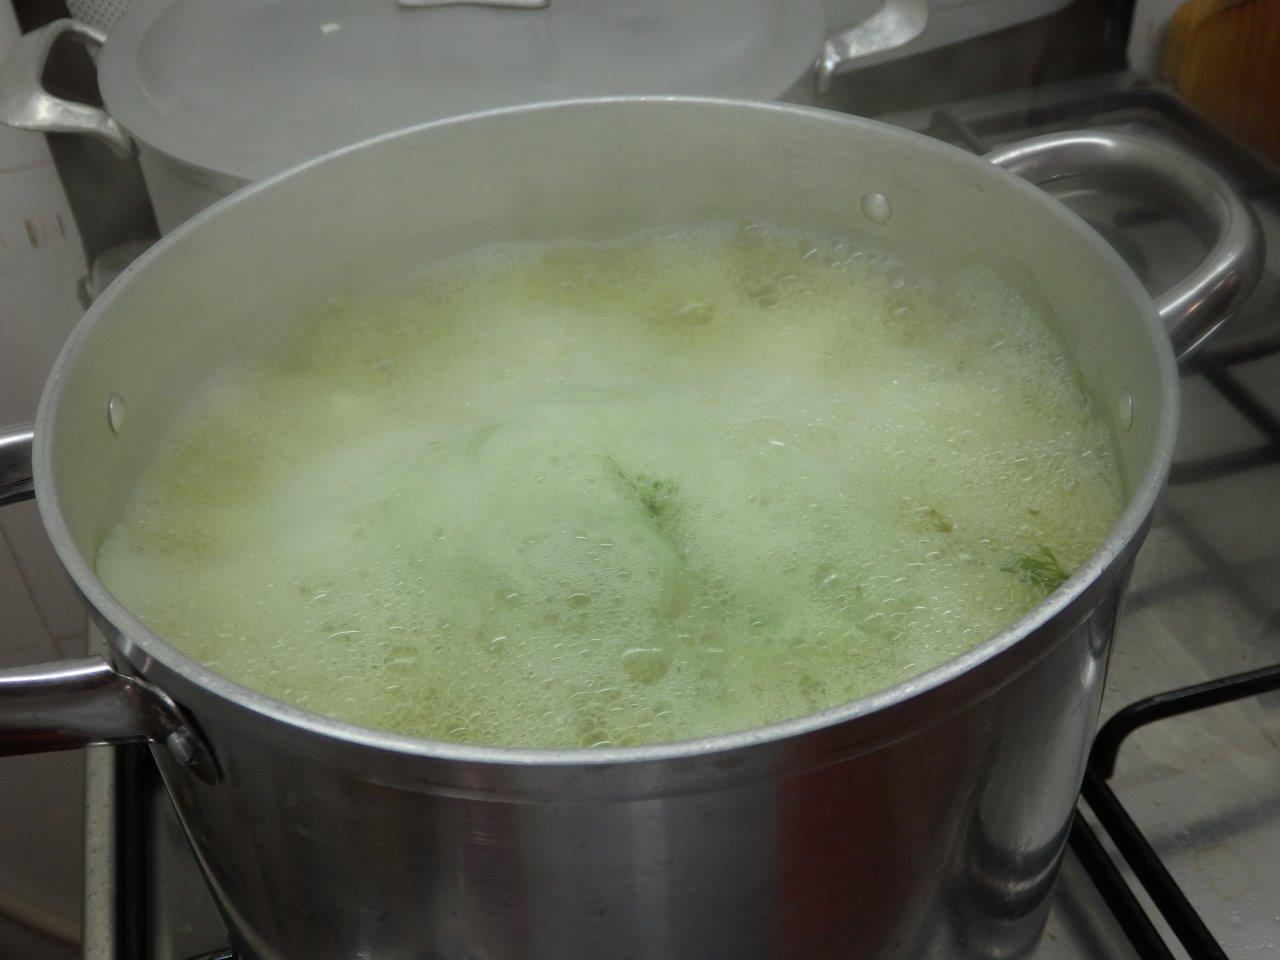 sopa em creme de favas Sopa em creme de Favas Sopa em creme de Favas 10